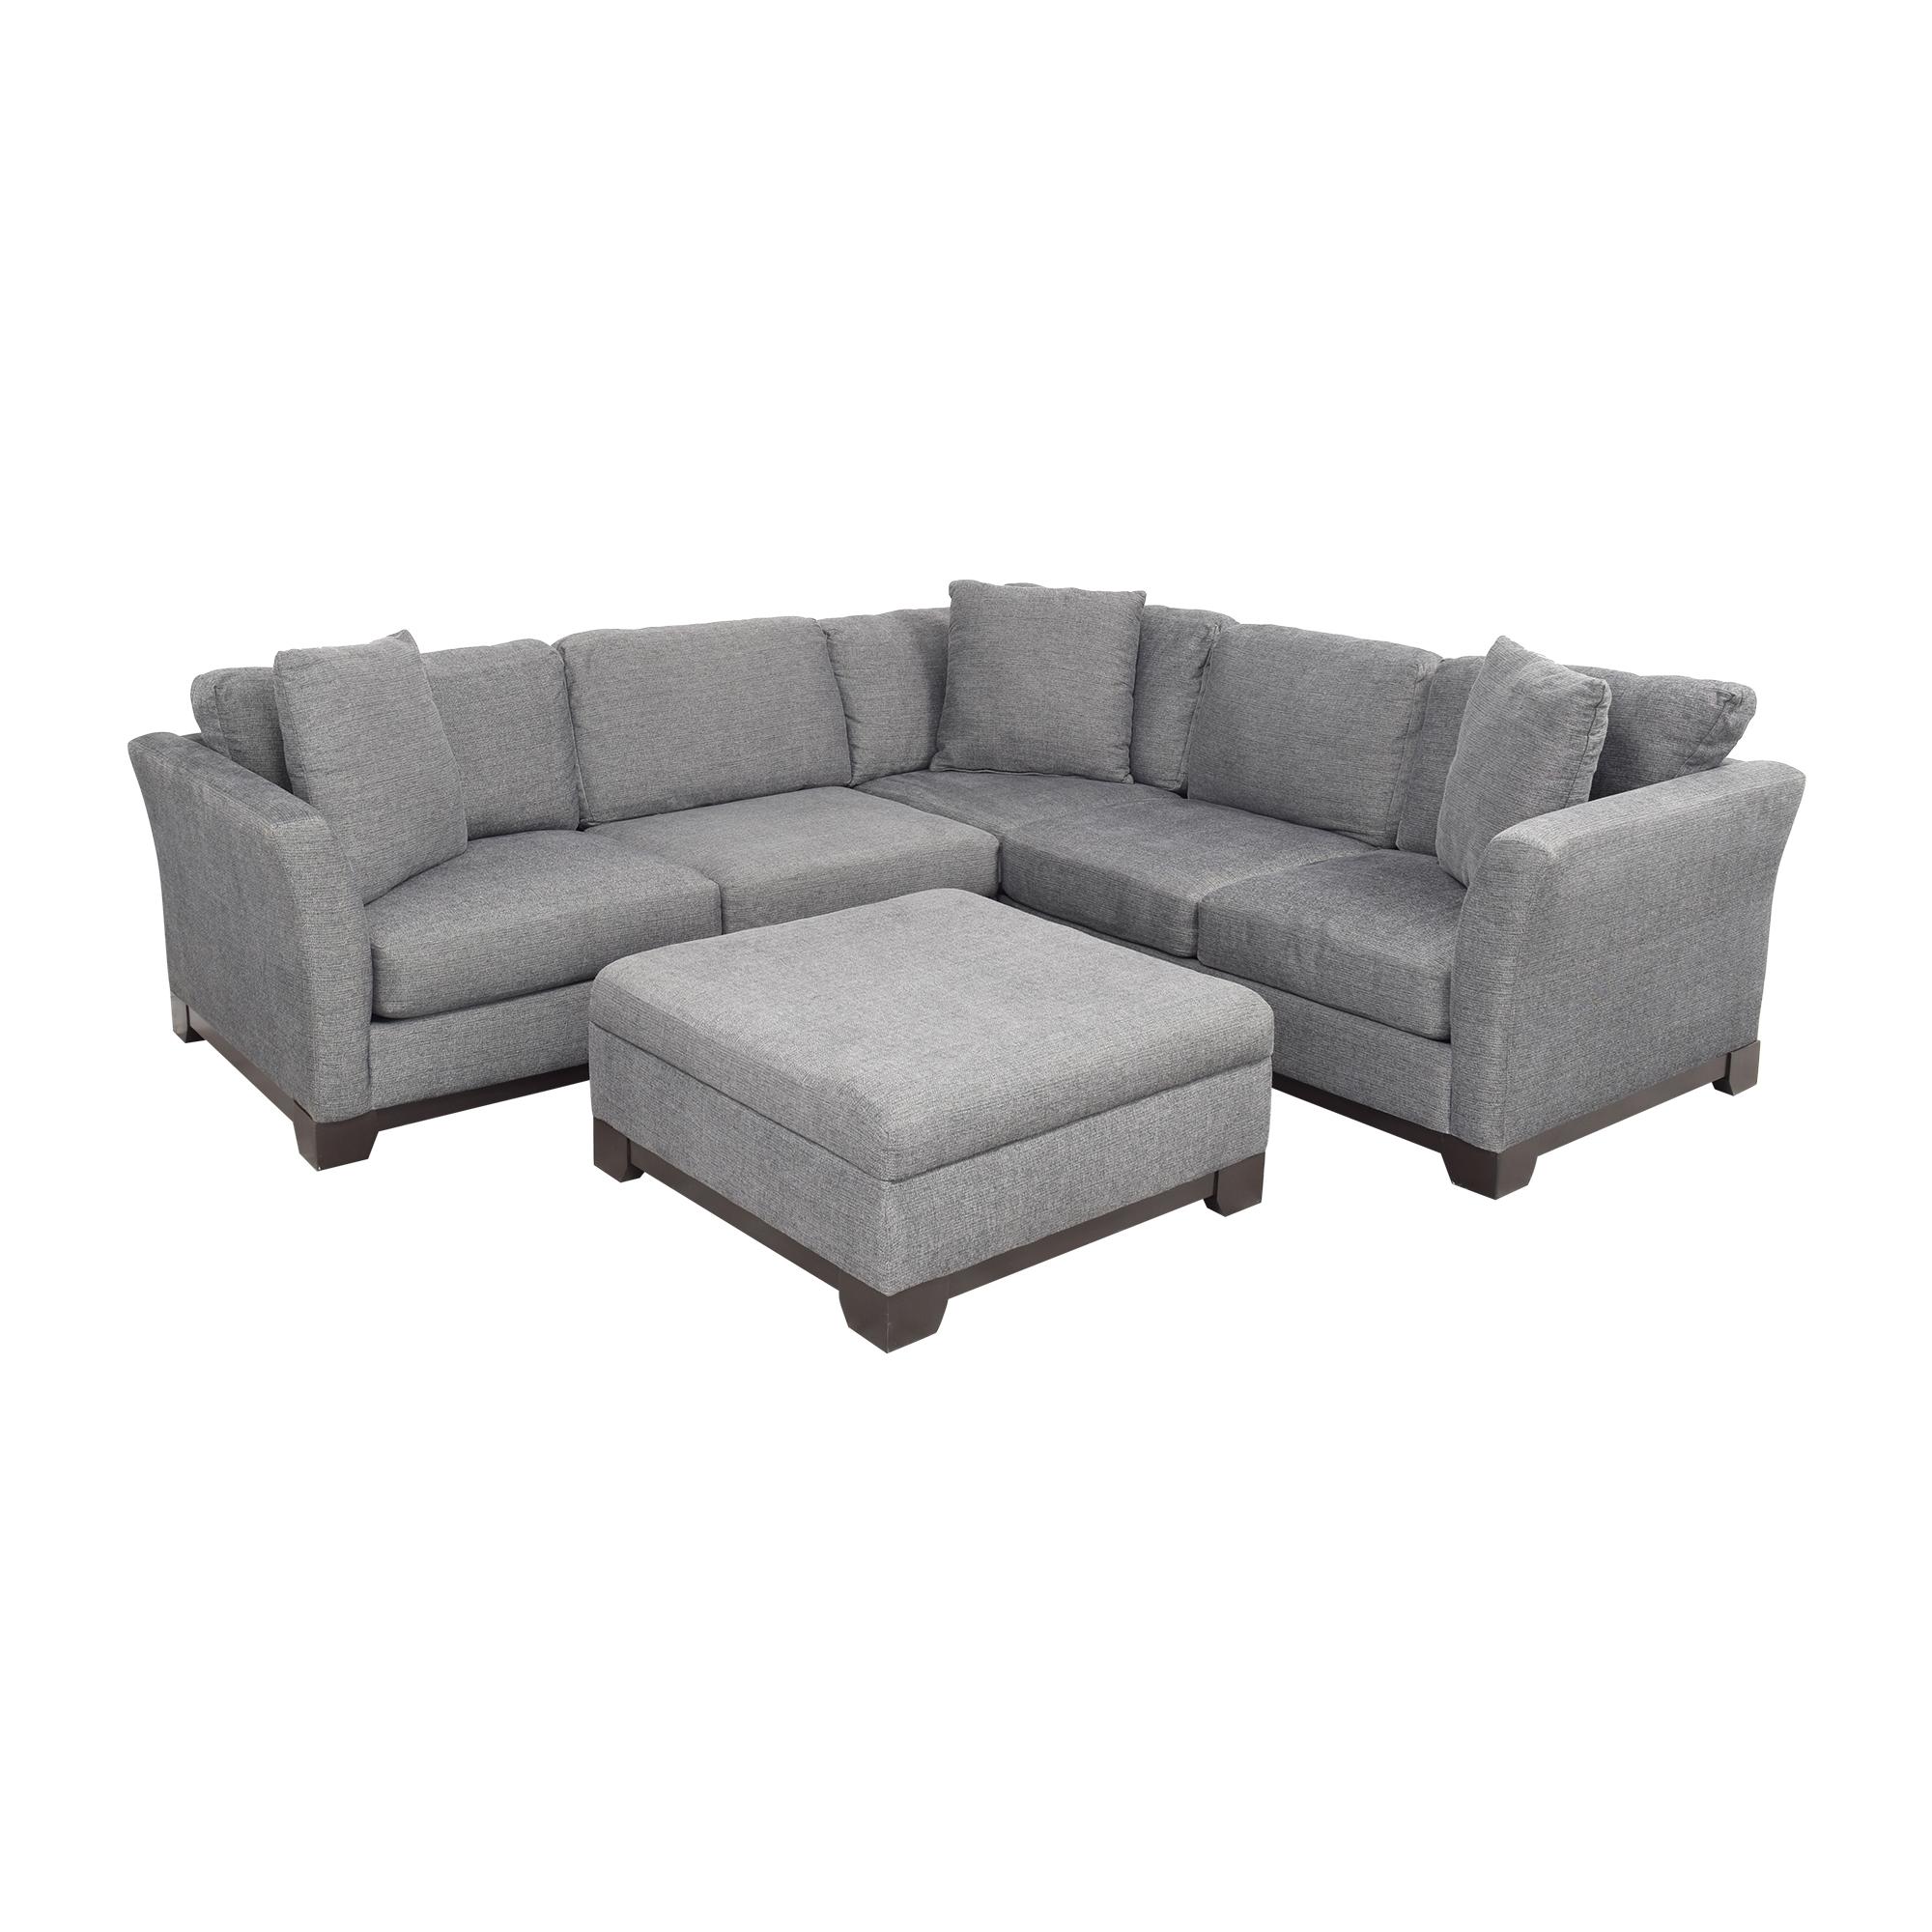 Jonathan Louis Jonathan Louis Elliot II Apartment Sectional Sofa with Storage Ottoman nj